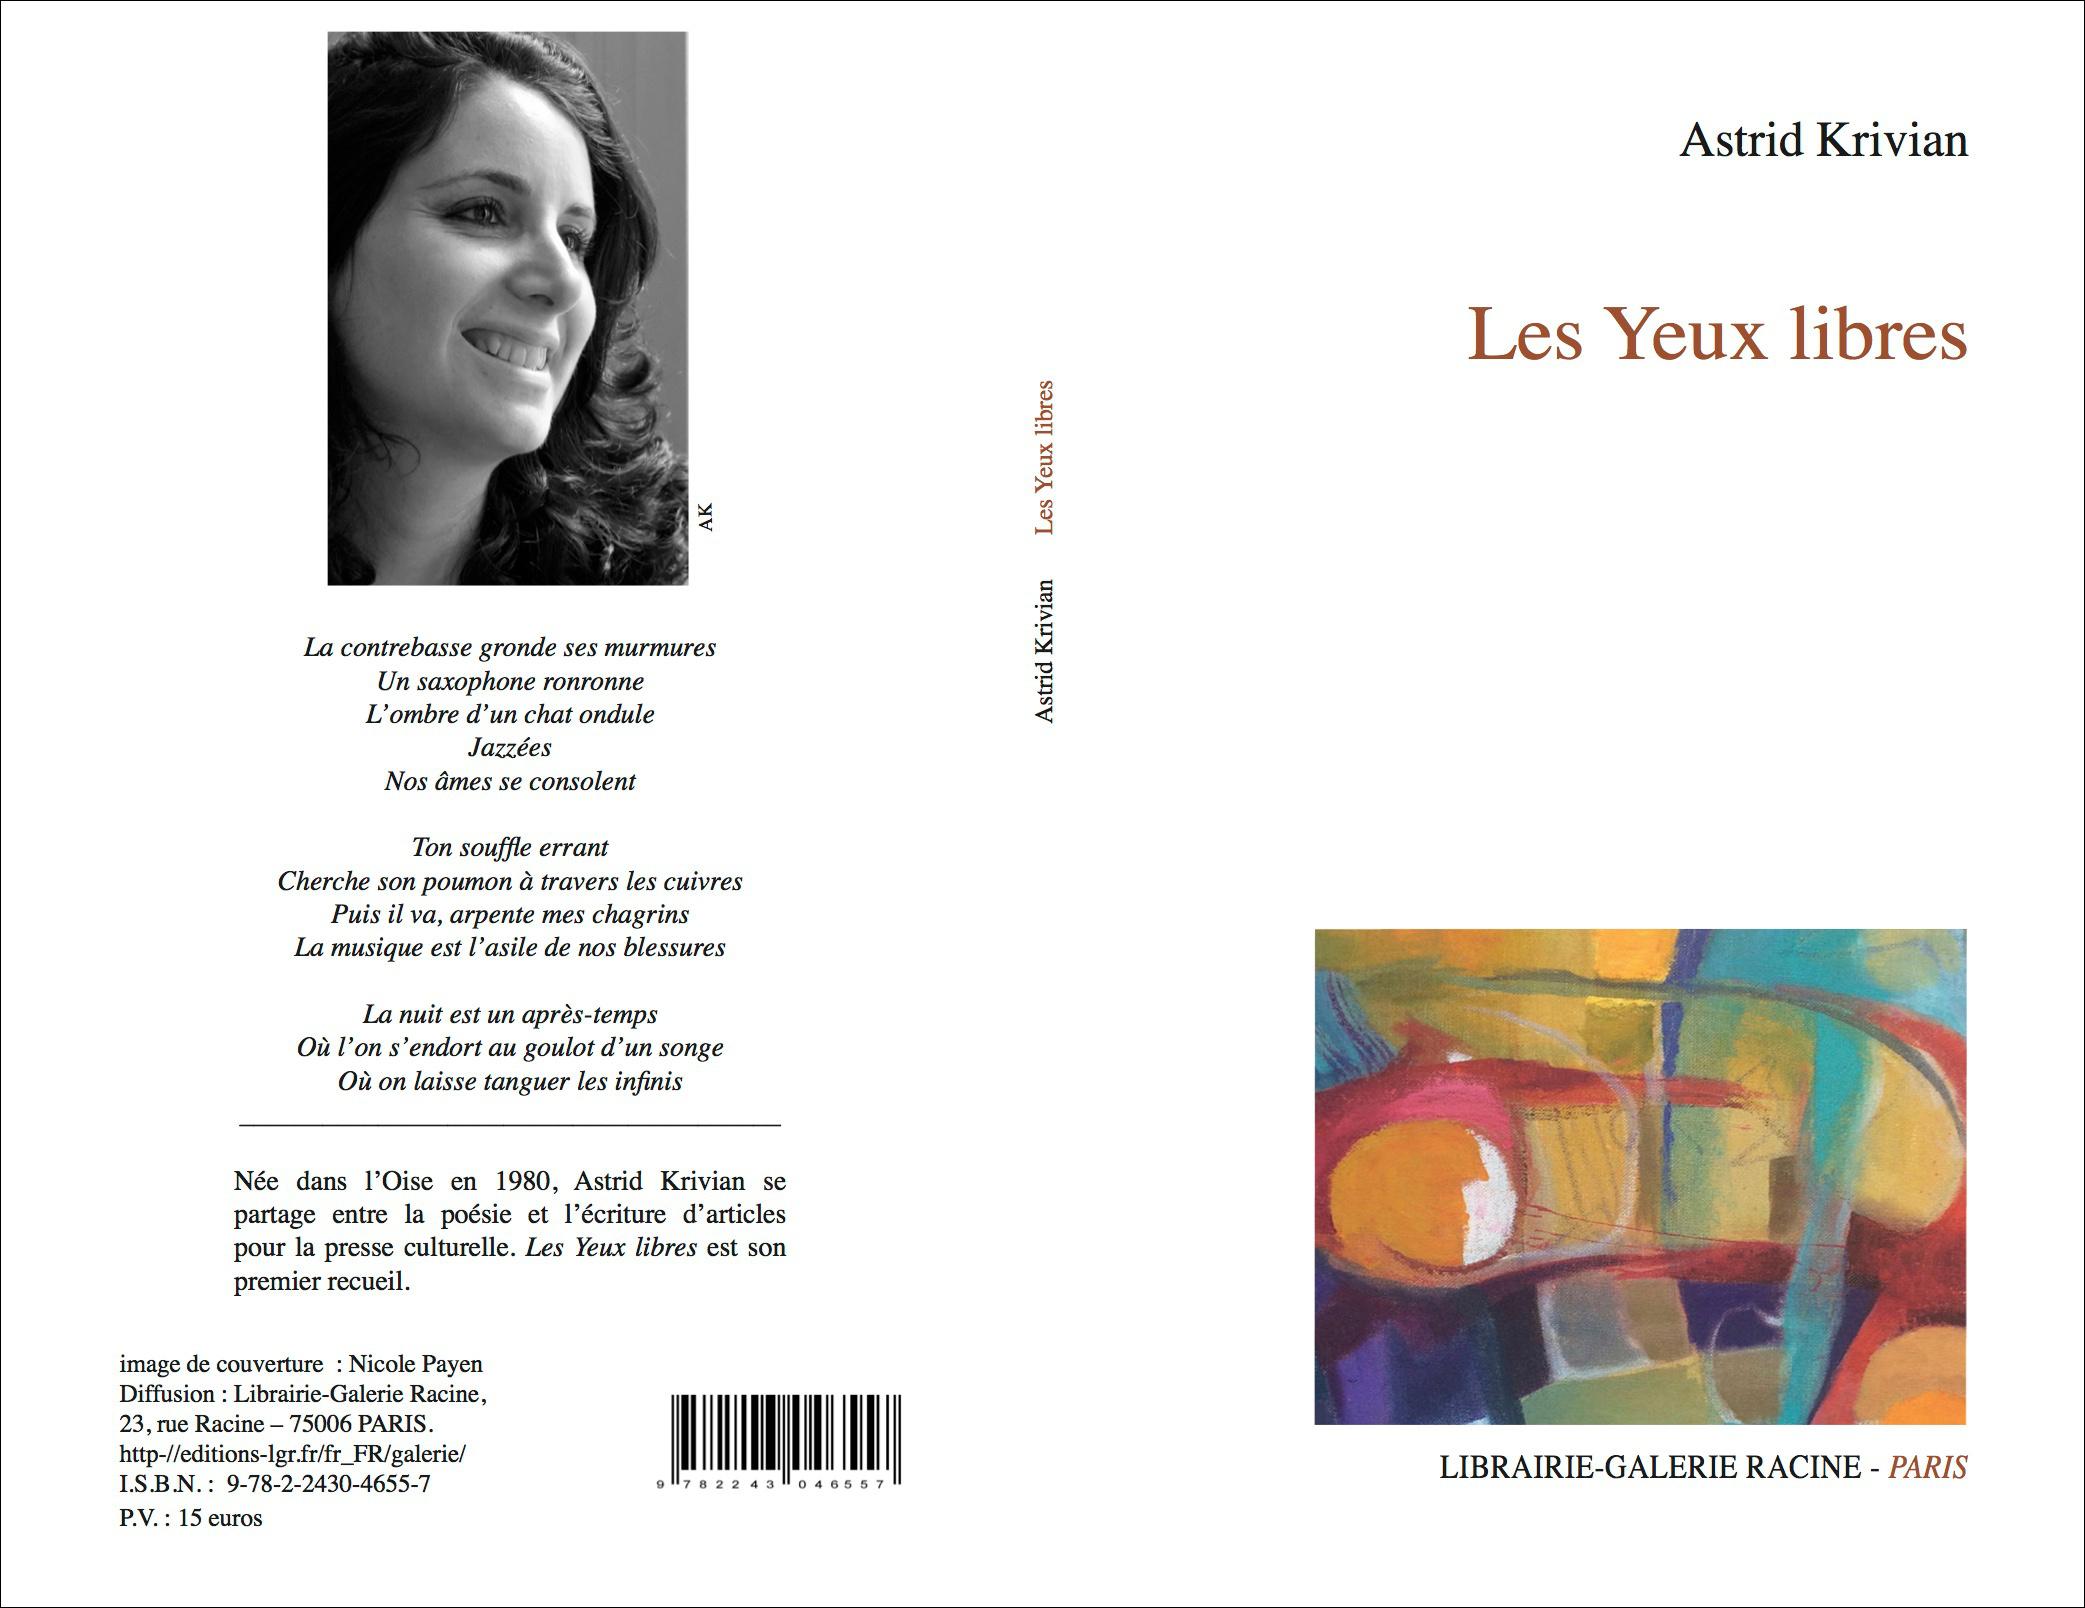 Astrid Krivian - Les Yeux libres